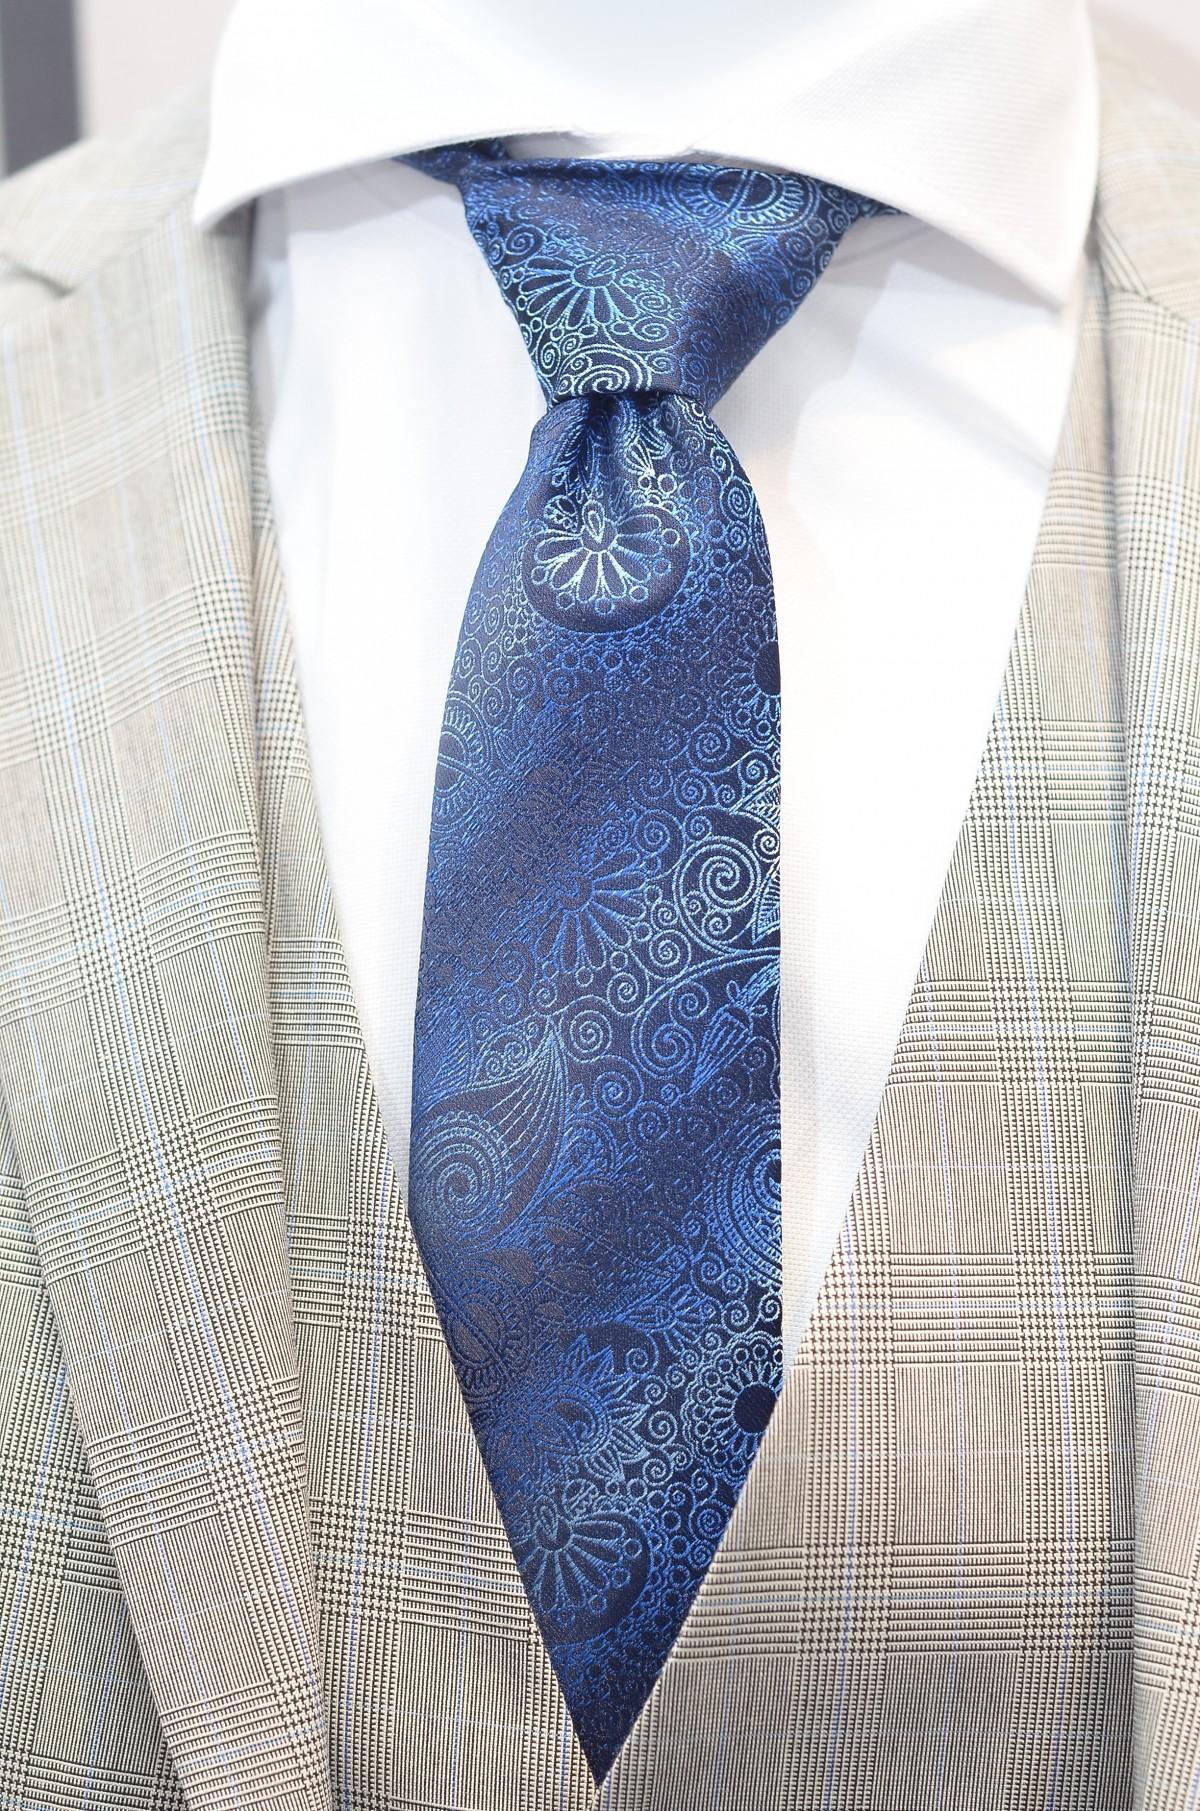 Kostenlose foto : Anzug, Muster, Krawatte, blau, Material, Textil ...